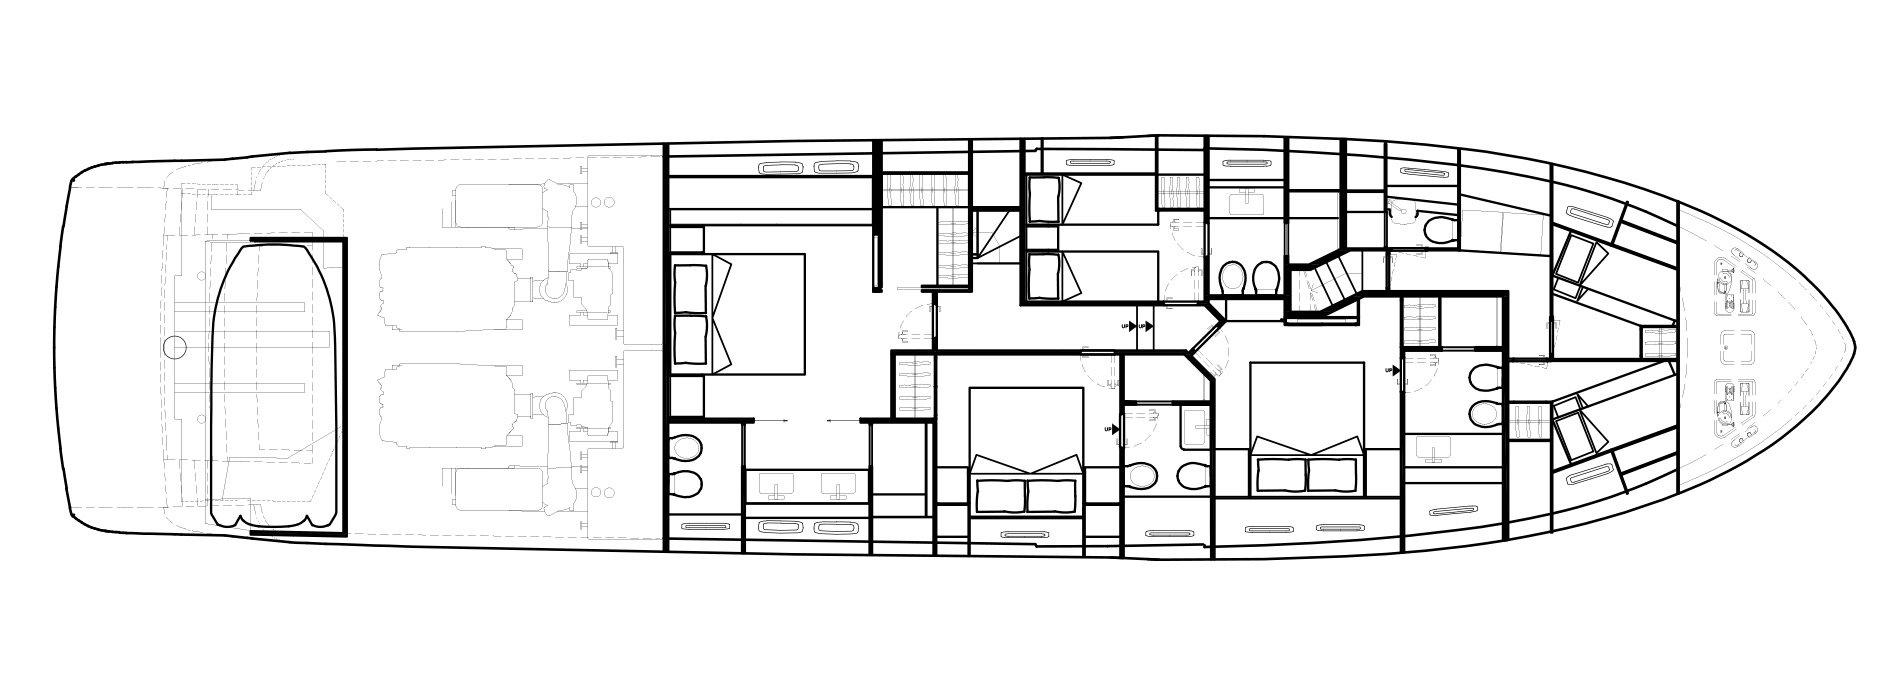 Sanlorenzo Yachts SL86 Lower Deck Versione B